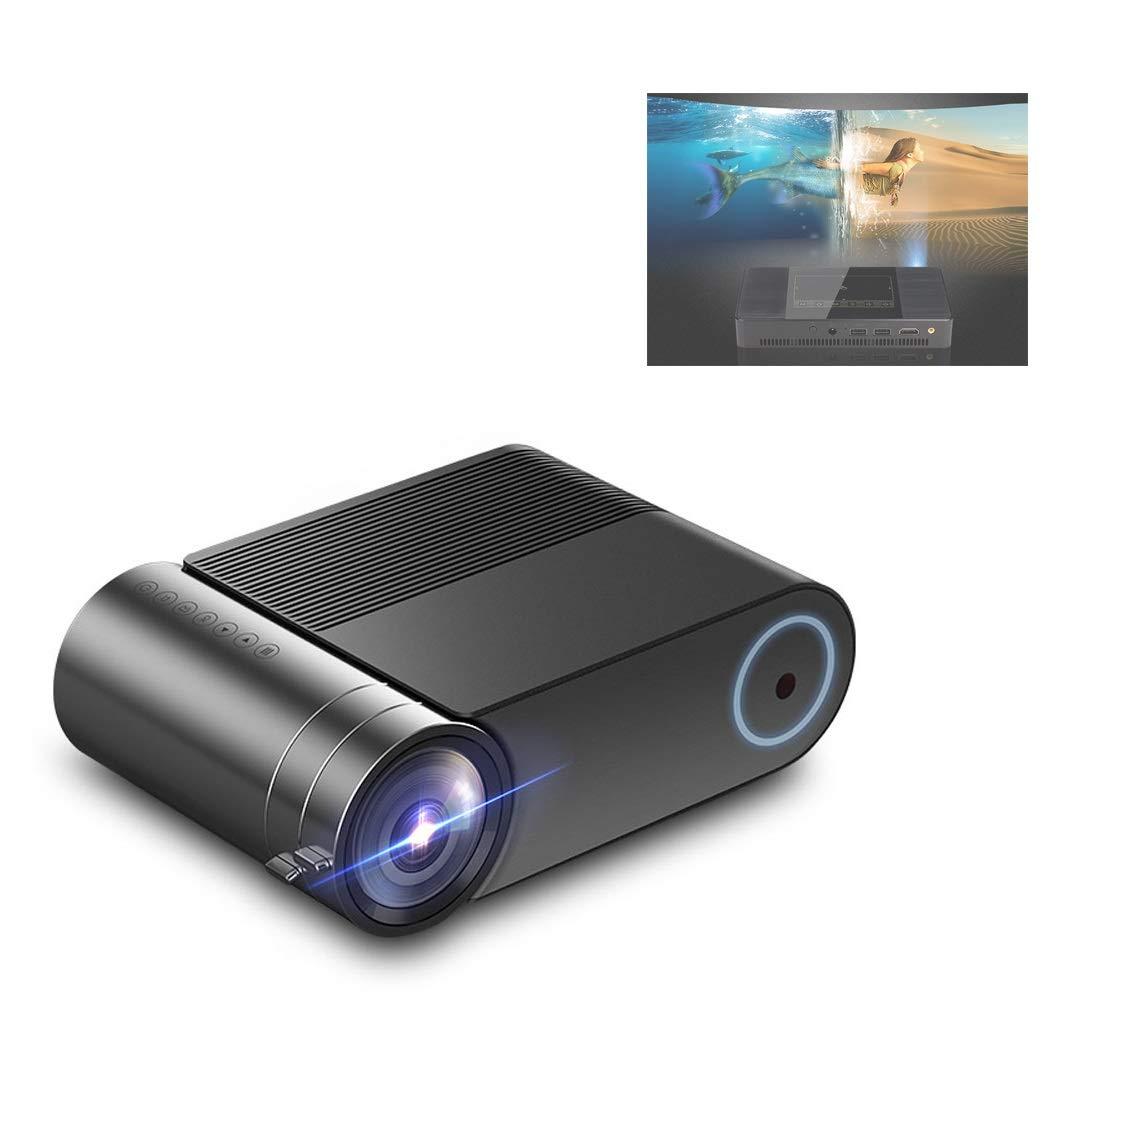 YG420 HD LEDプロジェクター、同じスクリーンが付いている総本店720Pの映画館プロジェクター B07QXMH8YB